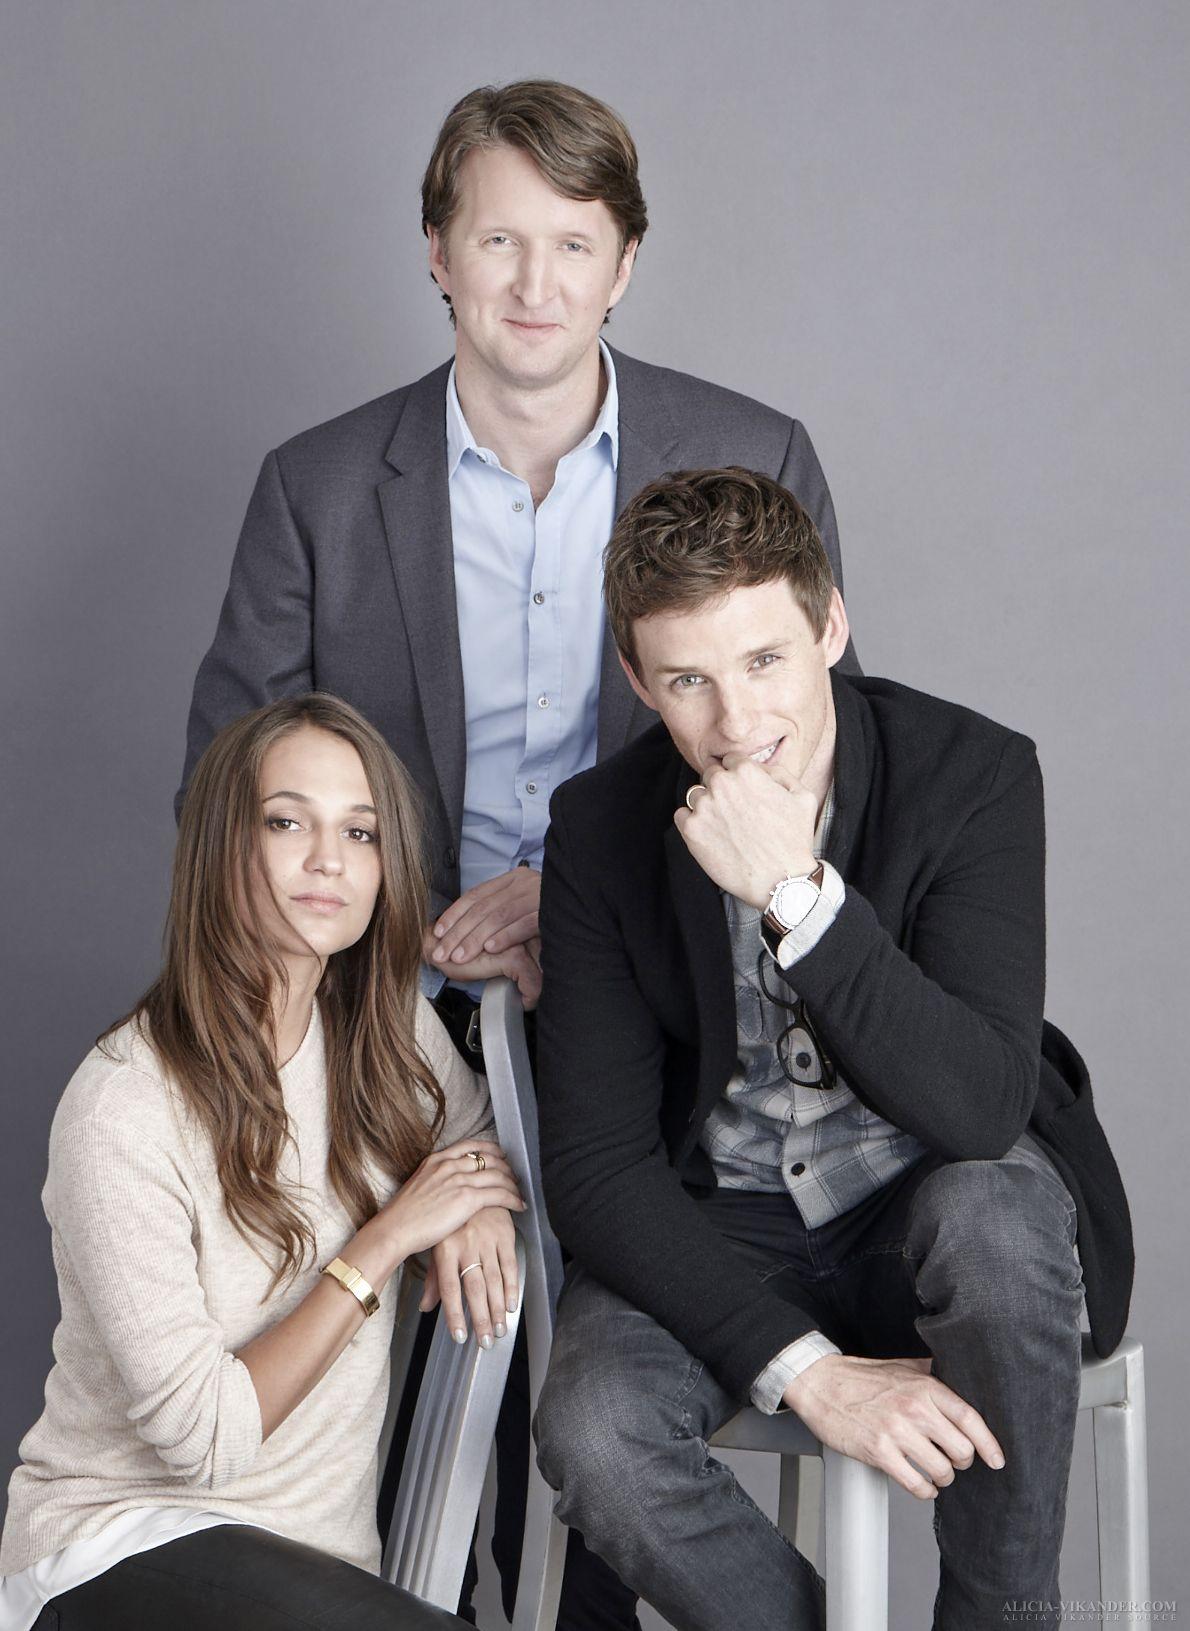 Toronto International Film Festival - 'The Danish Girl' Portraits 2